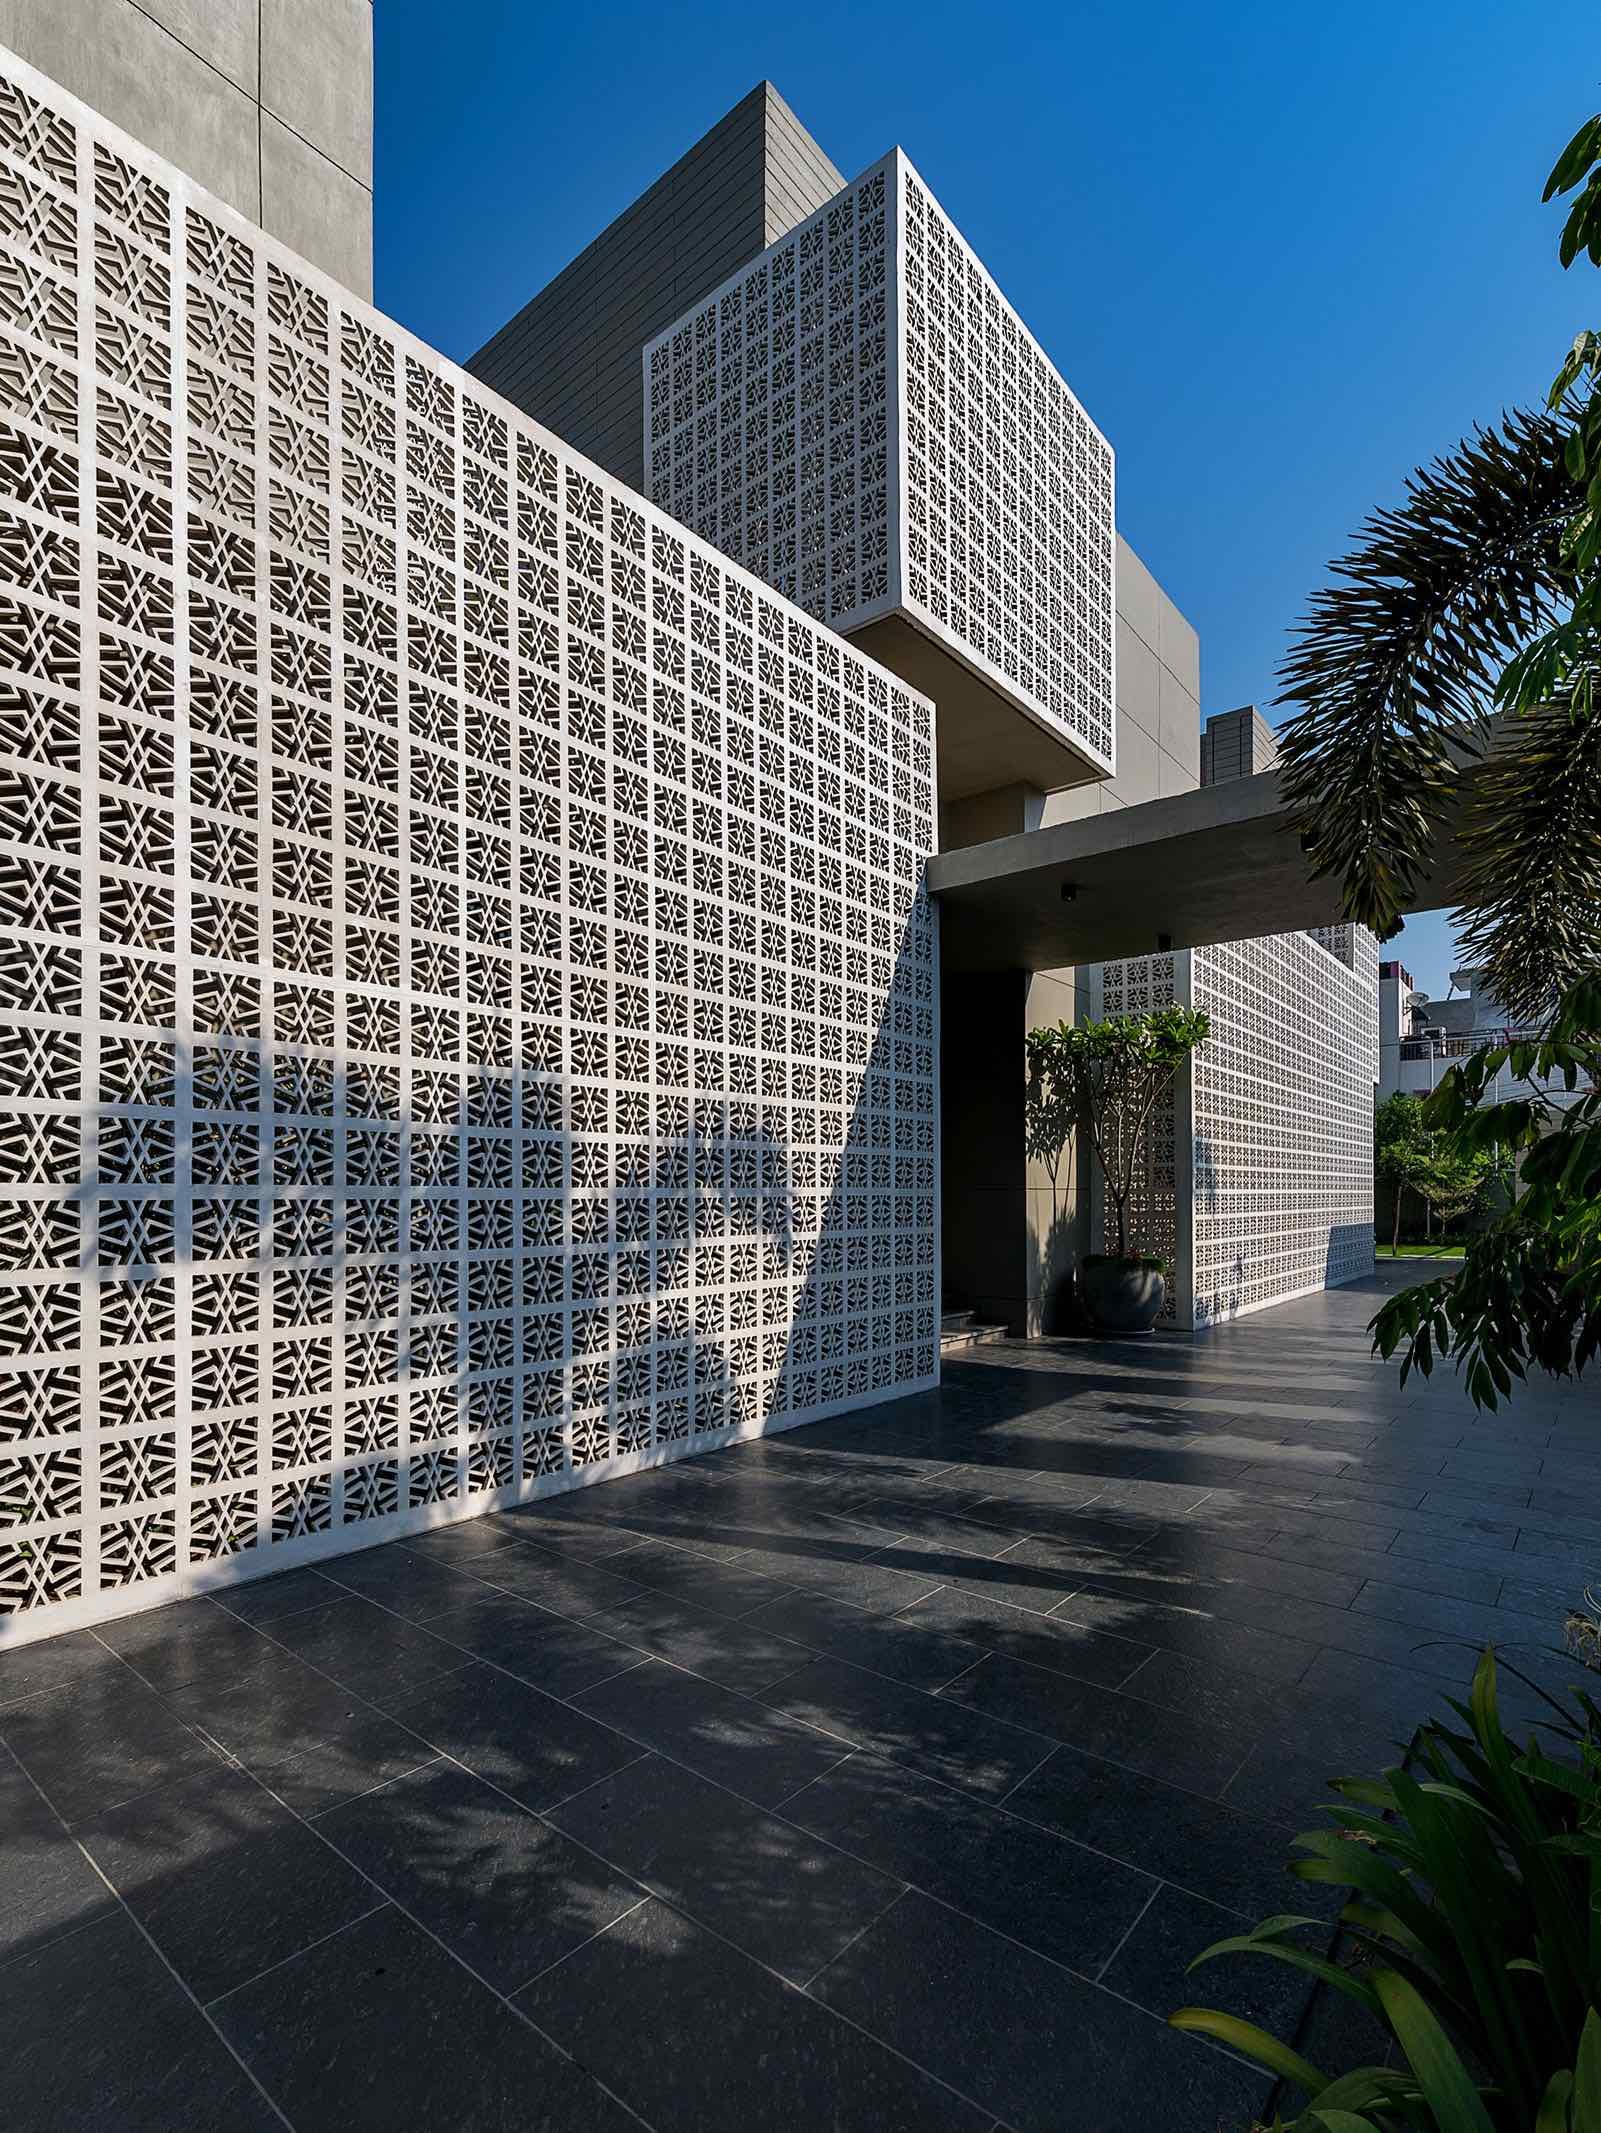 18_Screens_Sanjay_Puri_architects_india_amazingarchitecture_003.jpg